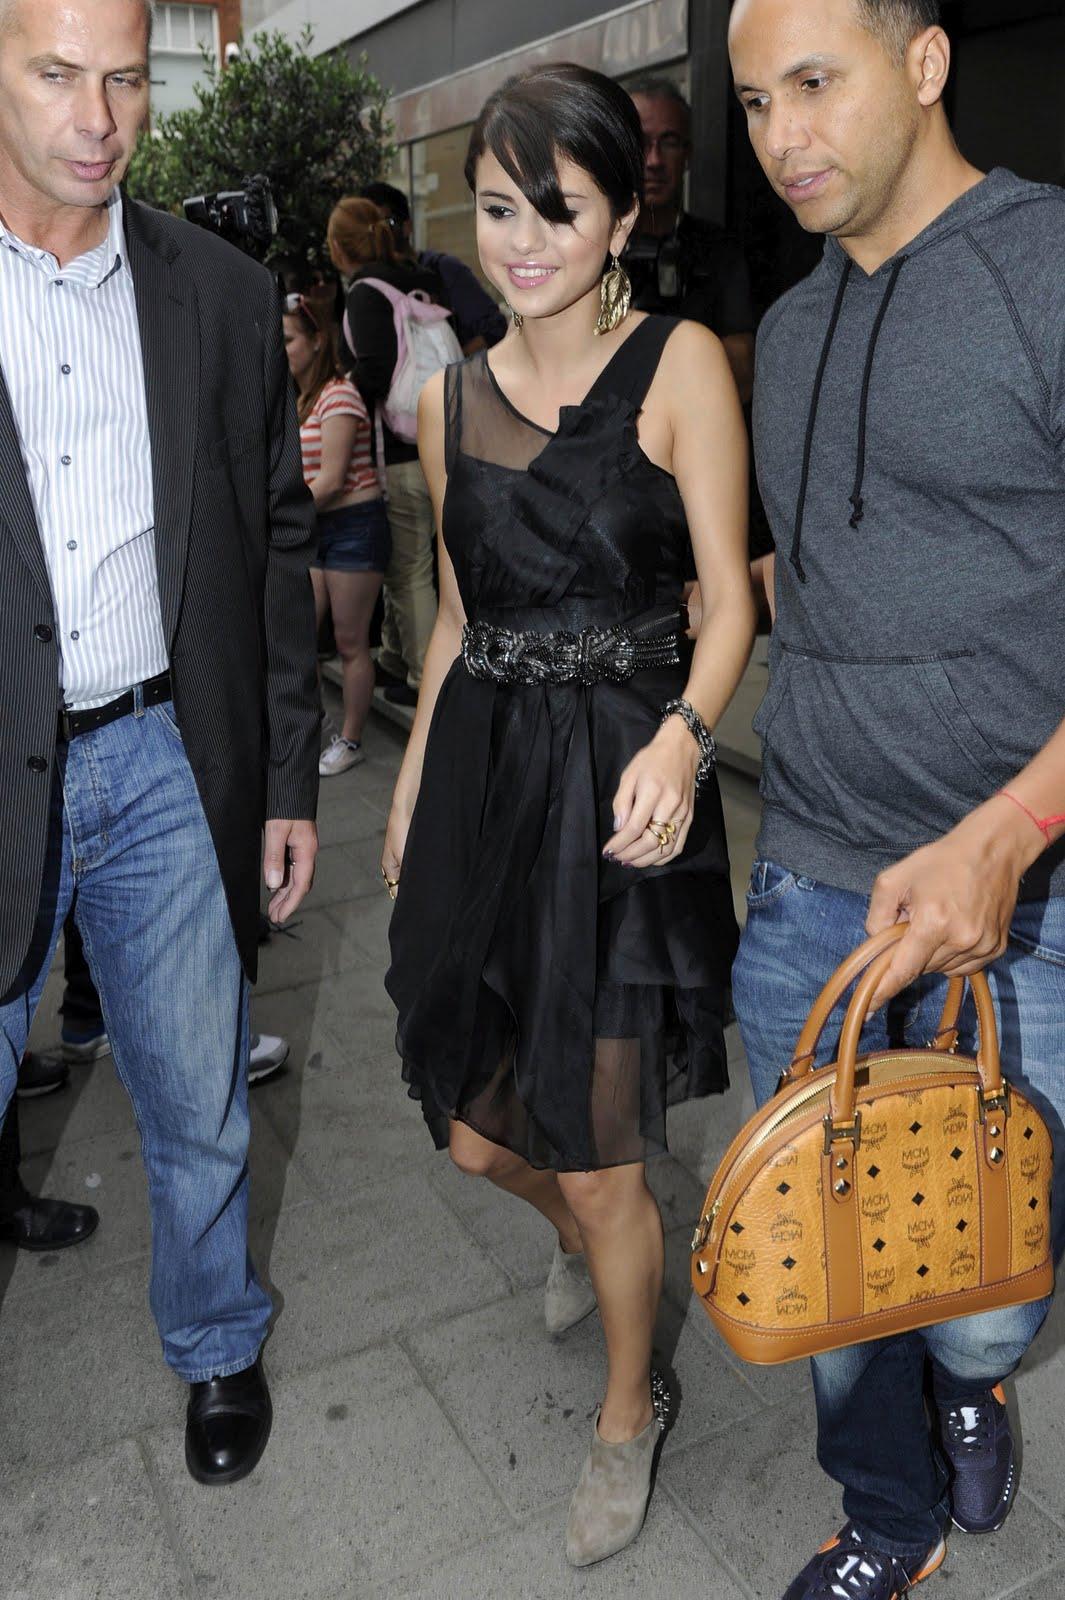 http://2.bp.blogspot.com/-mIBPAFOrEn8/ThSRfGqDGKI/AAAAAAAAAFw/PbPQ-pnEZmw/s1600/Selena-Gomez-blackdress-london%2B%25284%2529.jpg